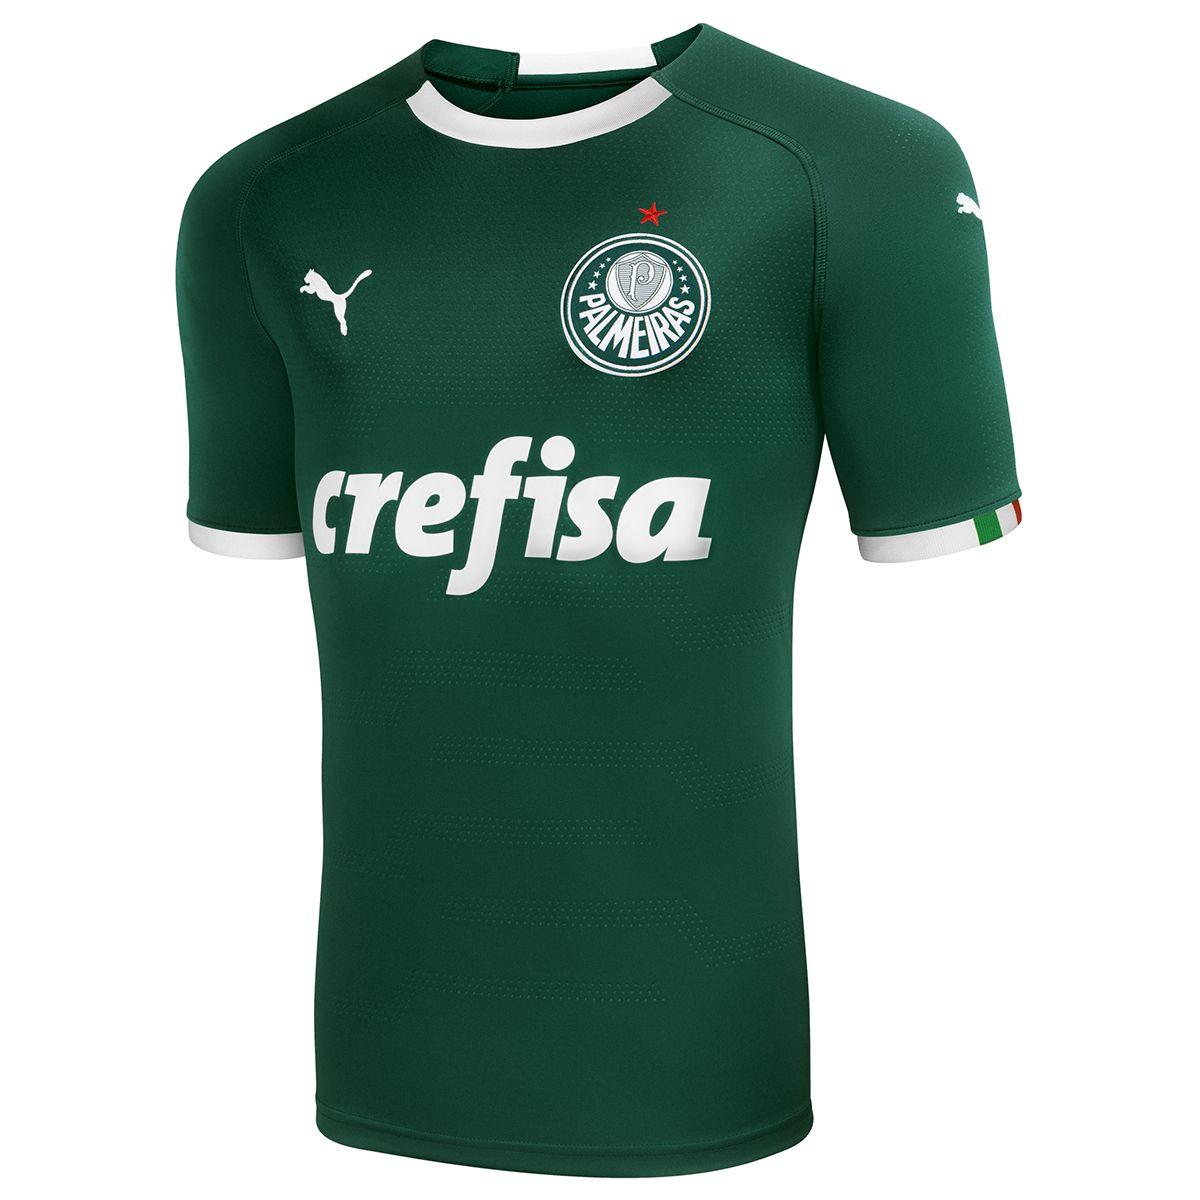 94637f1645 Camisa Adidas Palmeiras III 15 16 s nº Juvenil - Prata+Verde ...